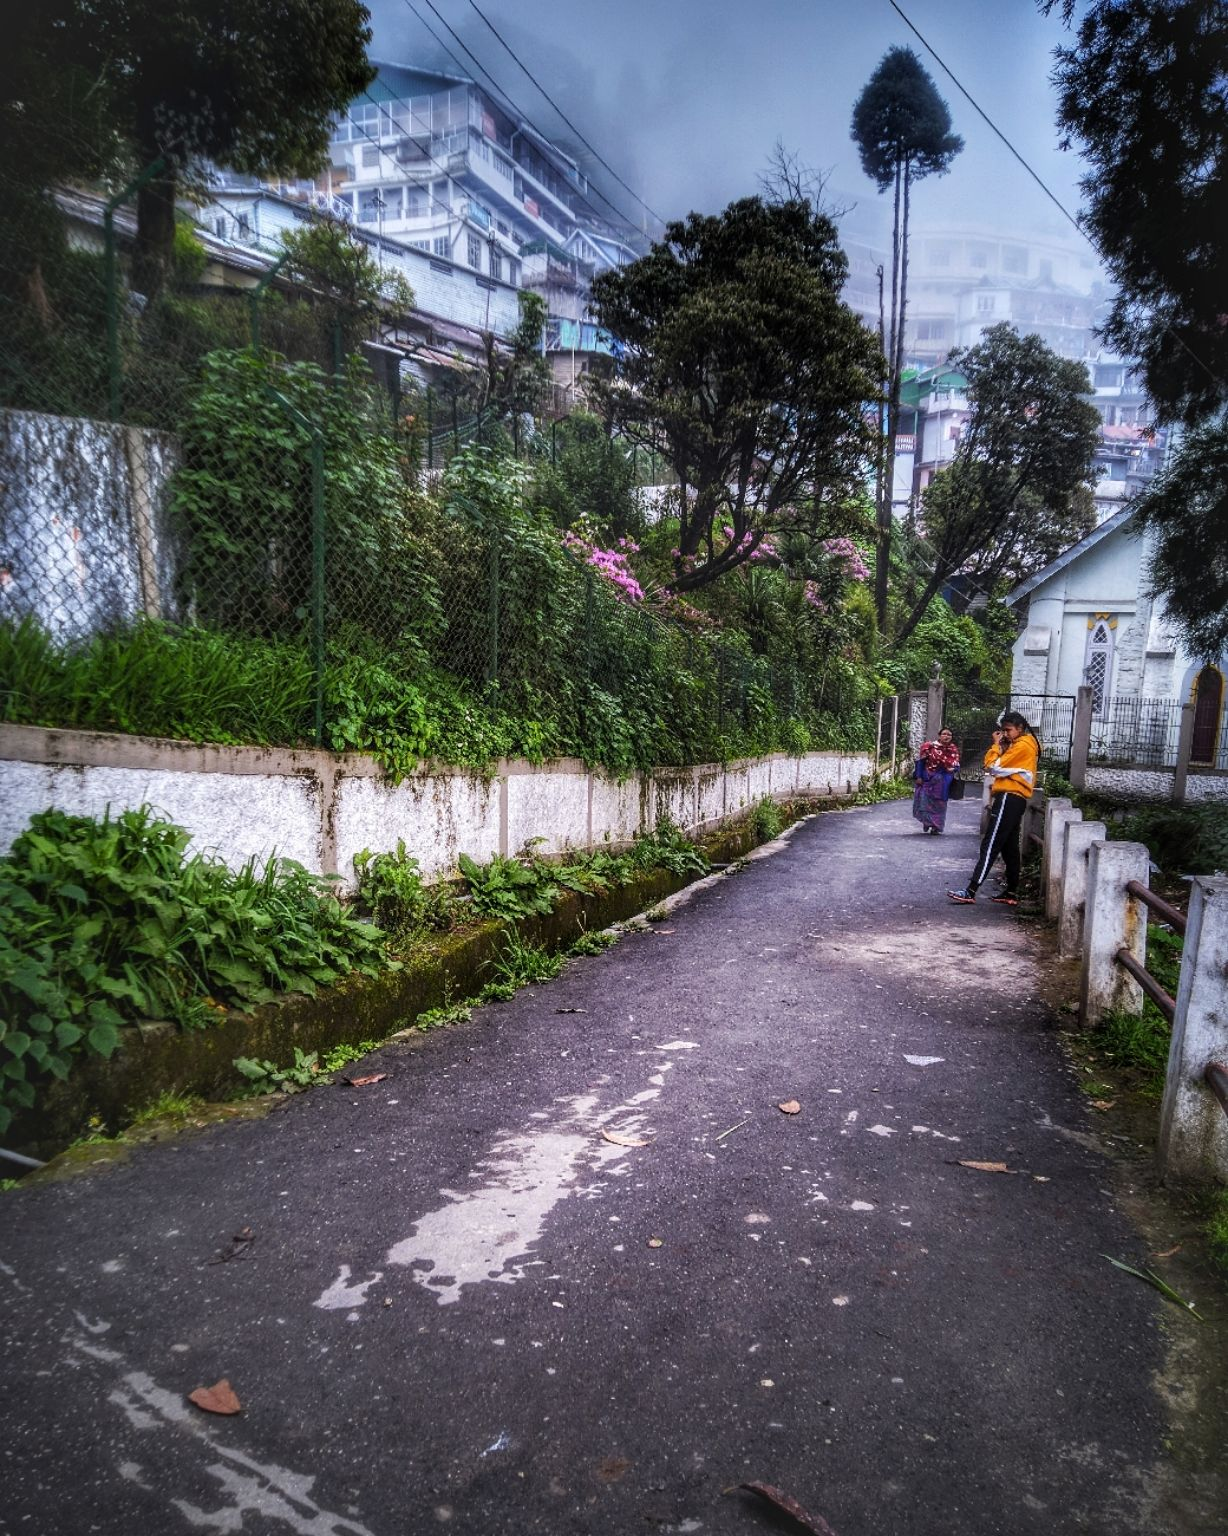 Photo of Darjeeling By raVi